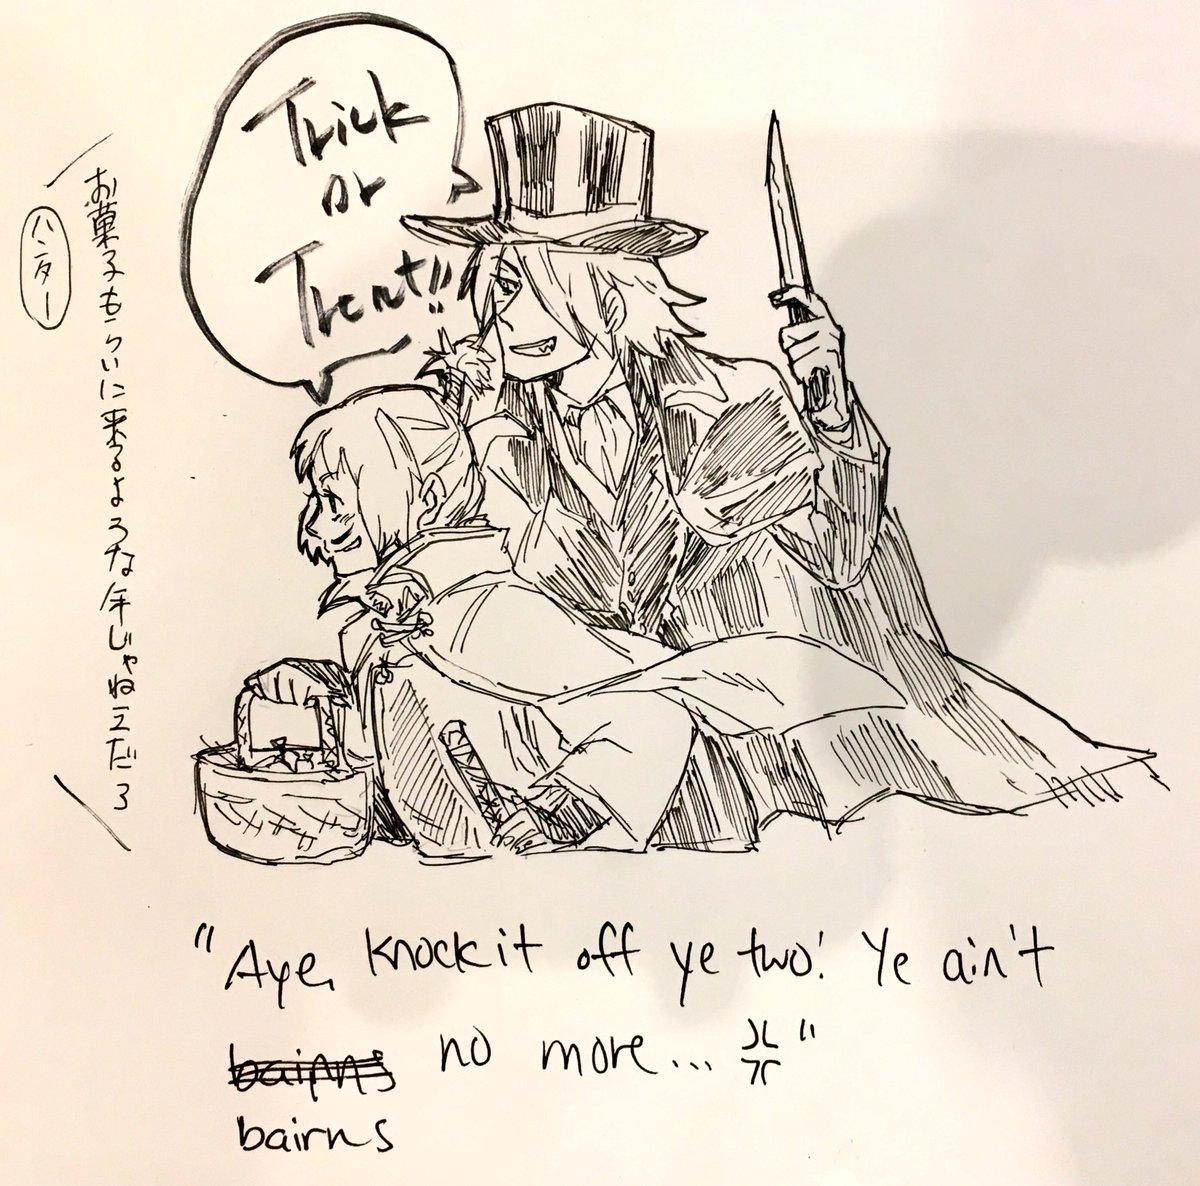 Kayuさんにお捧げ申したハロウィンアダしおスケブ、ハンターのセリフを翻訳してもらったんですが(下記)英語吹き替え版ノブ